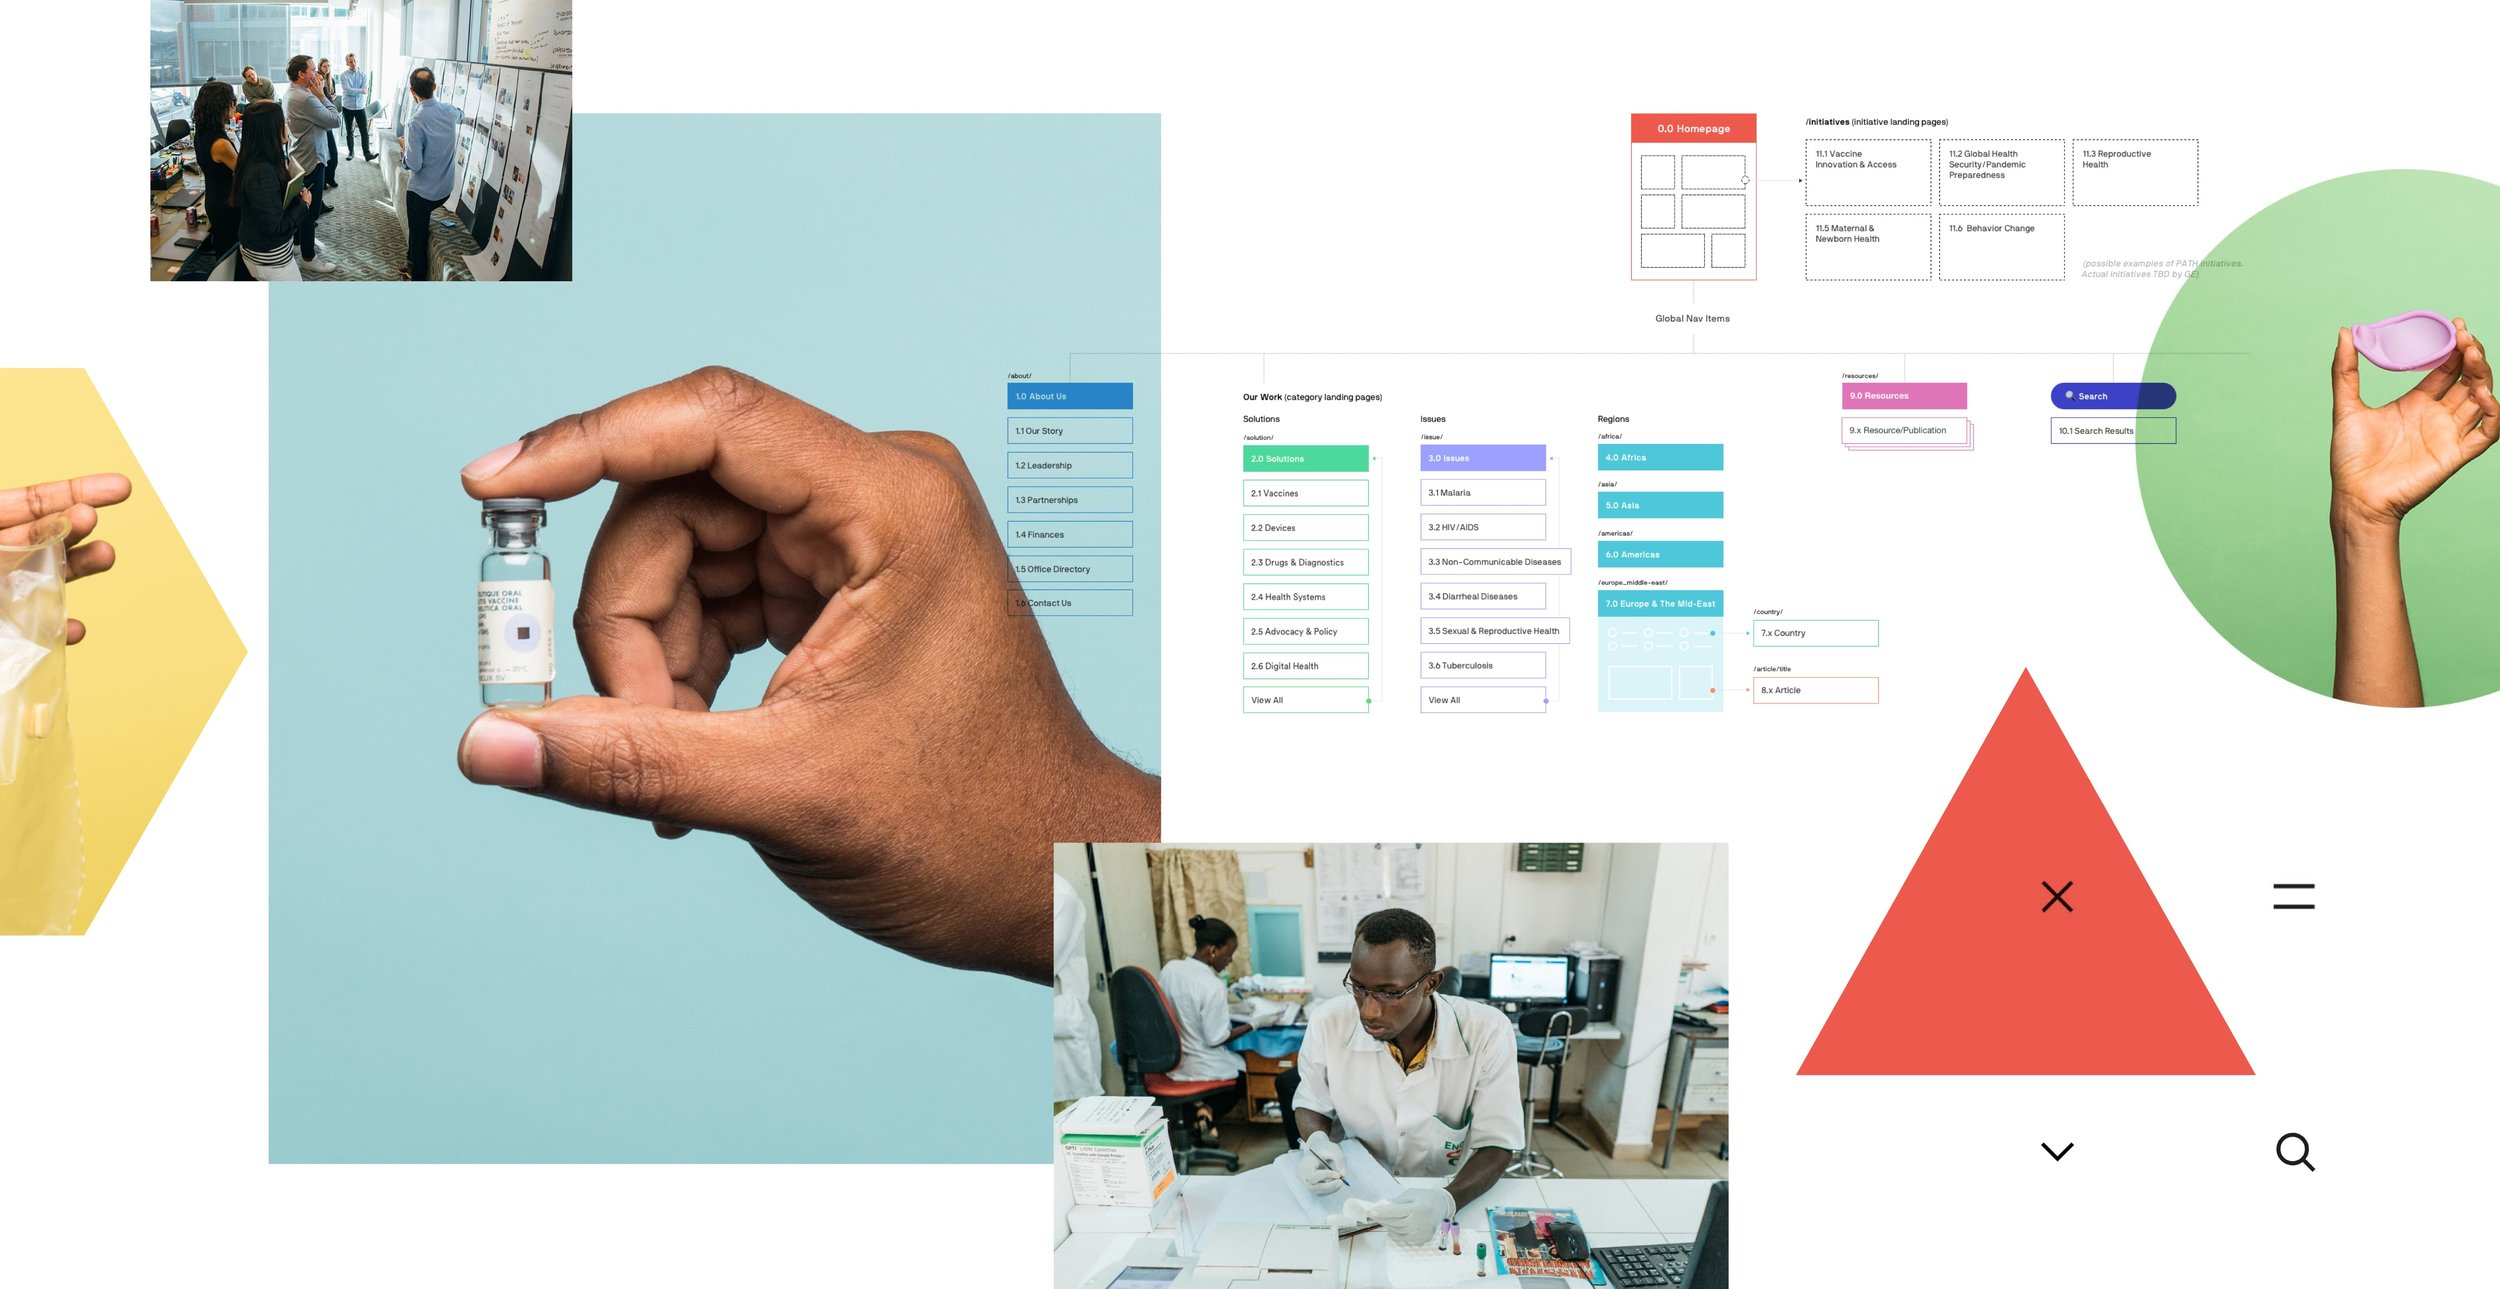 instrument-path-website-strategy-brand-design.jpeg